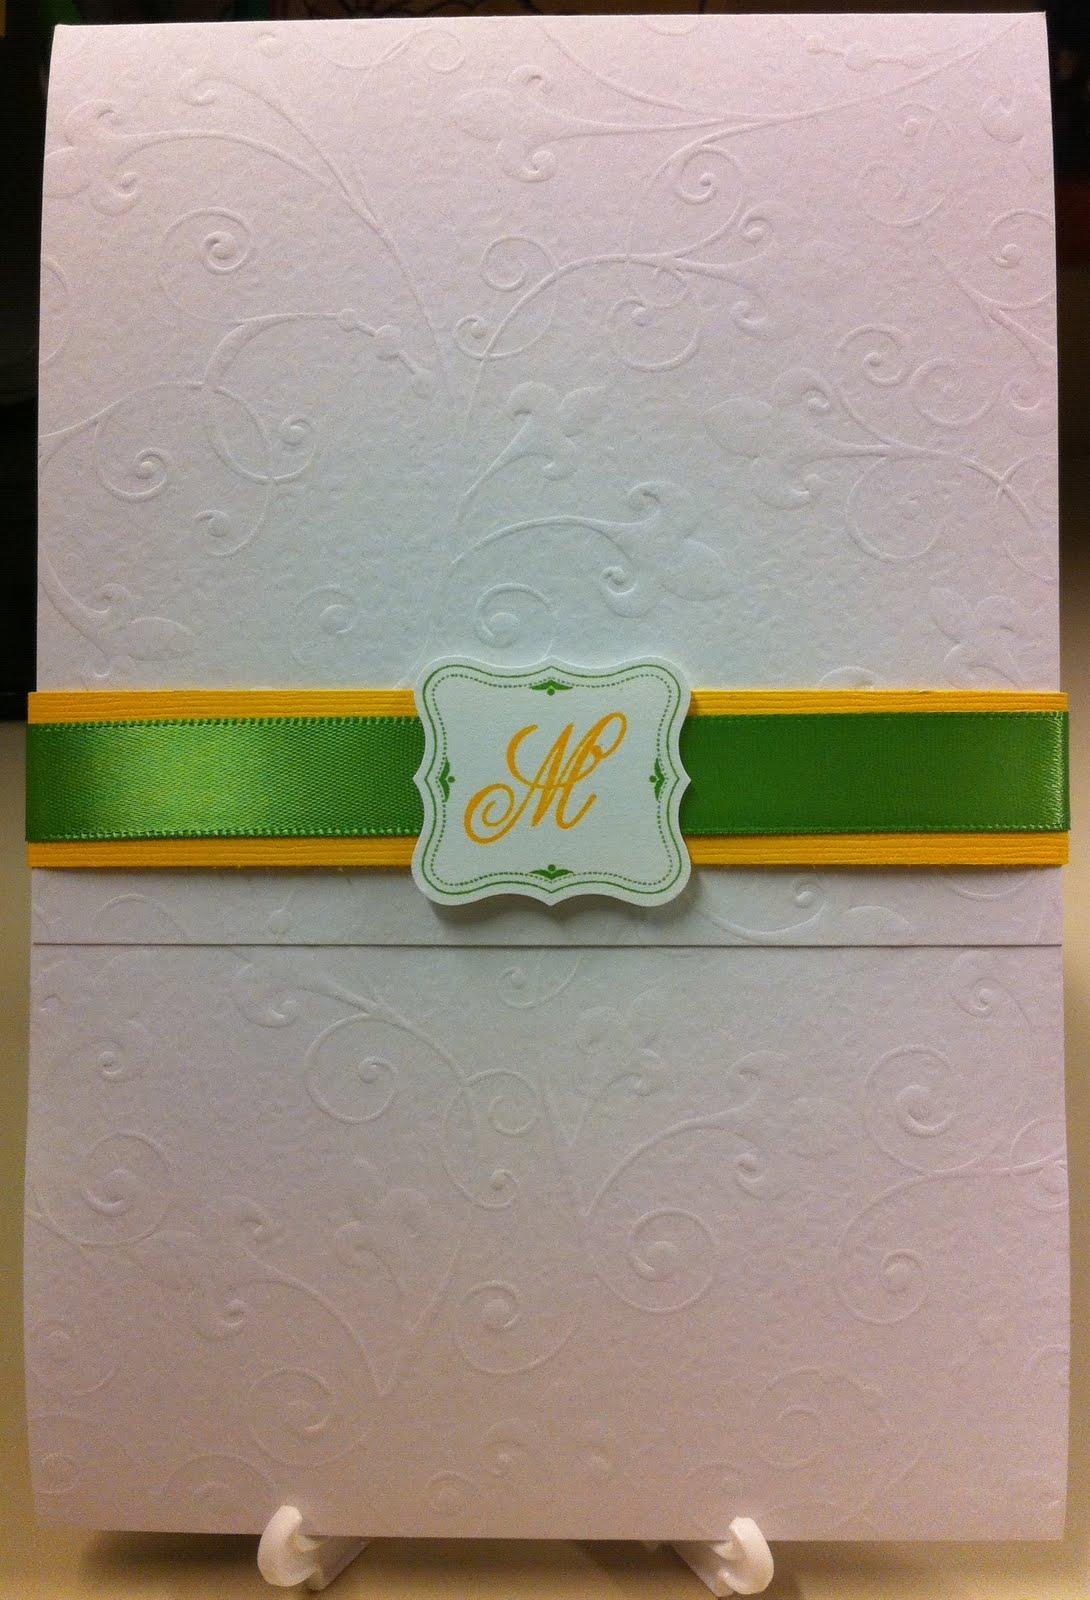 http://4.bp.blogspot.com/_xyiZRuPHrYw/TIlWpbAH8pI/AAAAAAAAAXM/GEjKXN8EJCU/s1600/Lori%27s+Wedding+invitation.JPG